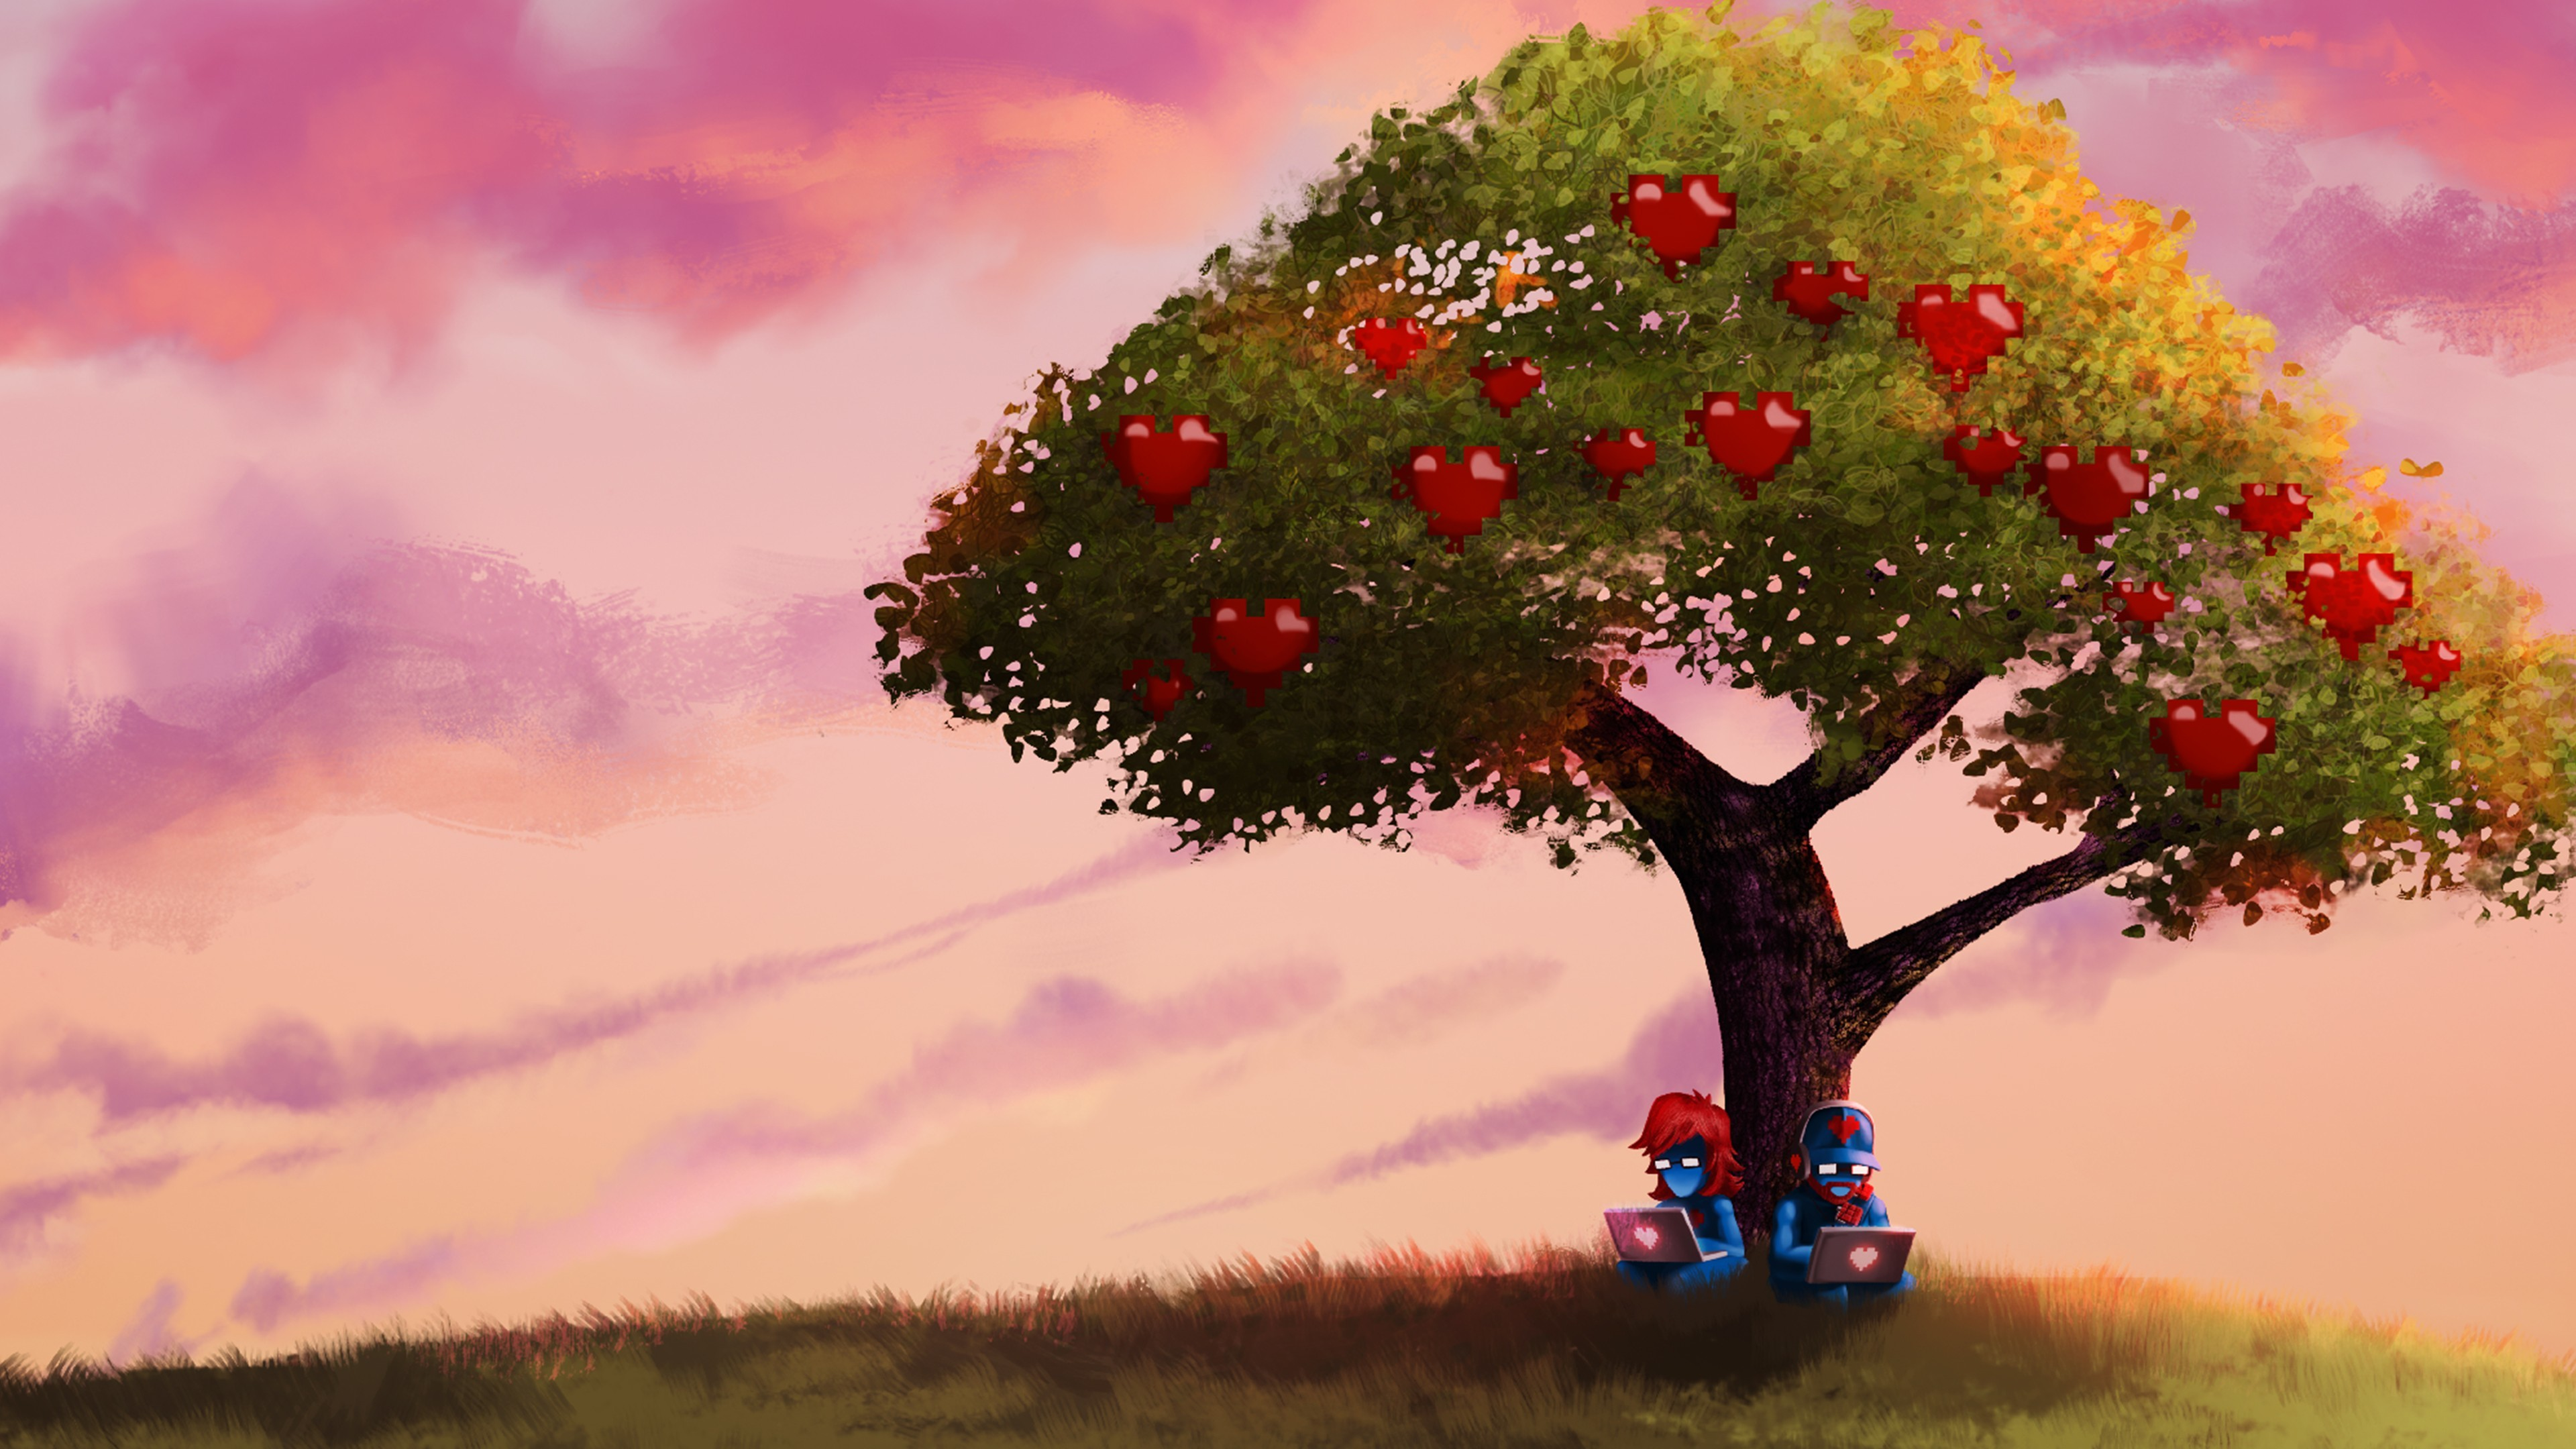 General Monstercat Pegboard Nerds trees sky fruit apples computer